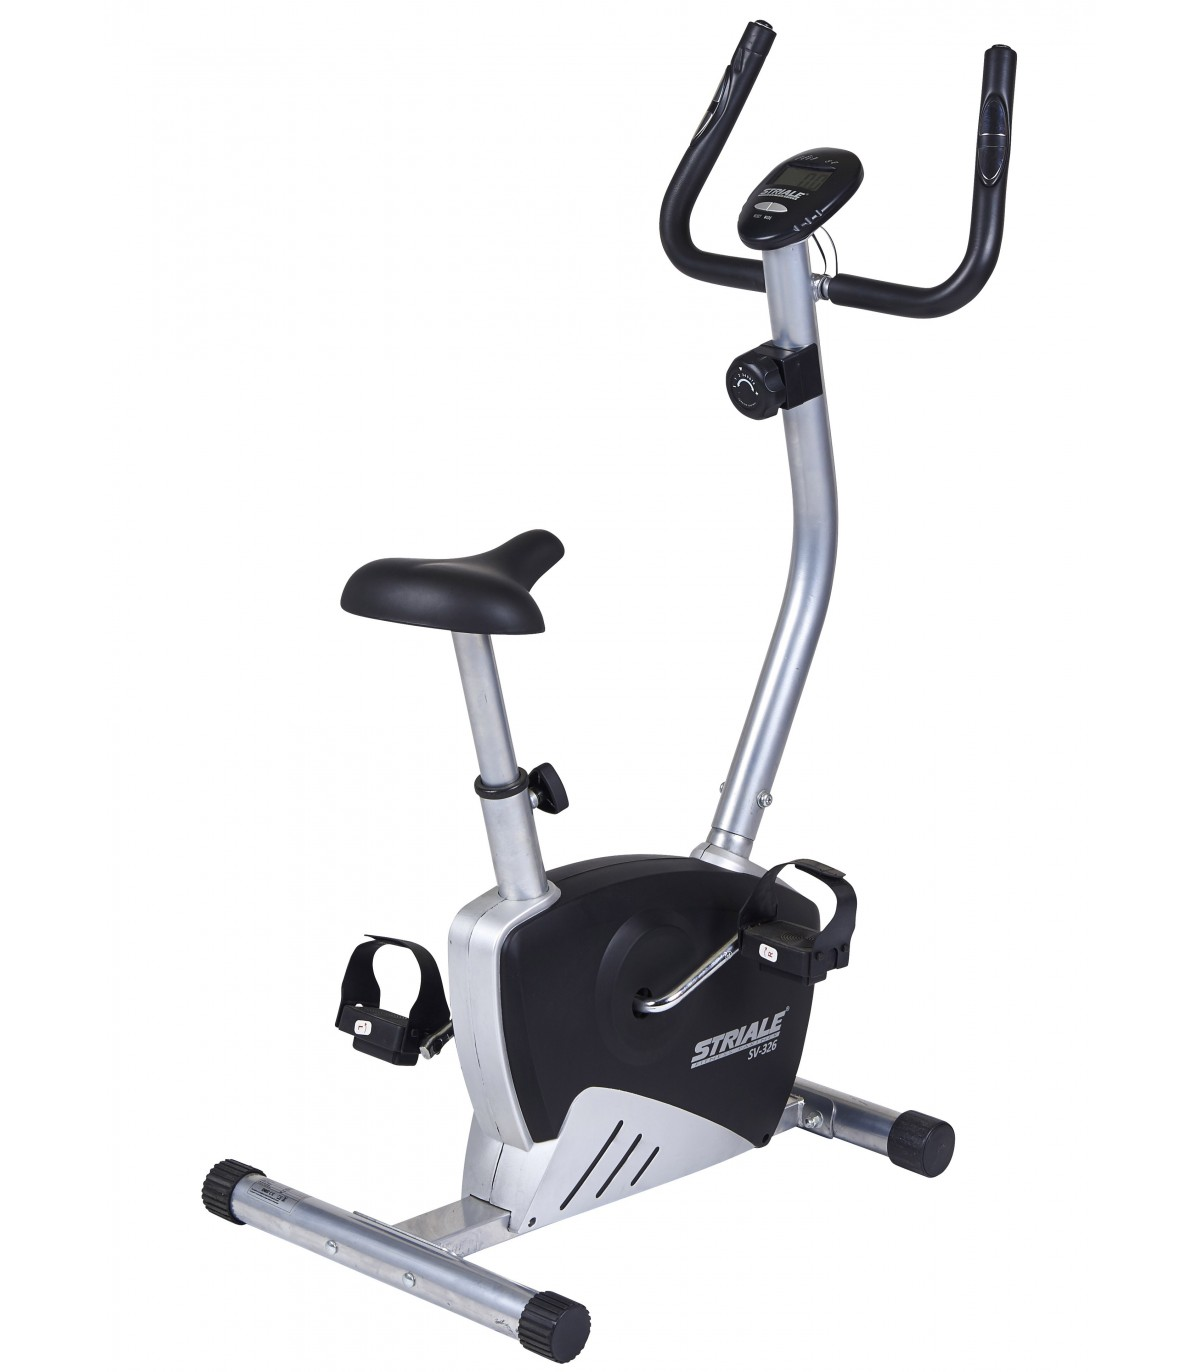 Vélo Dappartement Sv 326 Care Fitness